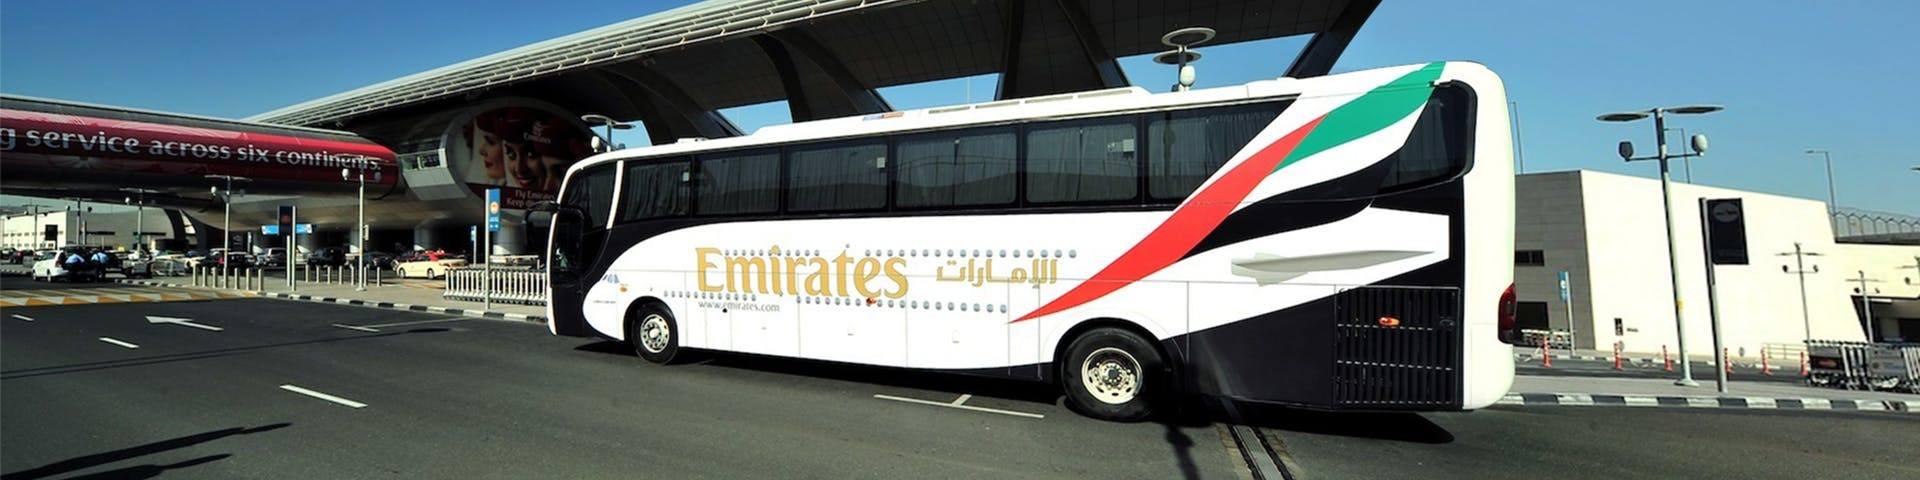 Shuttle Service Dubai International Airport Emirates United States